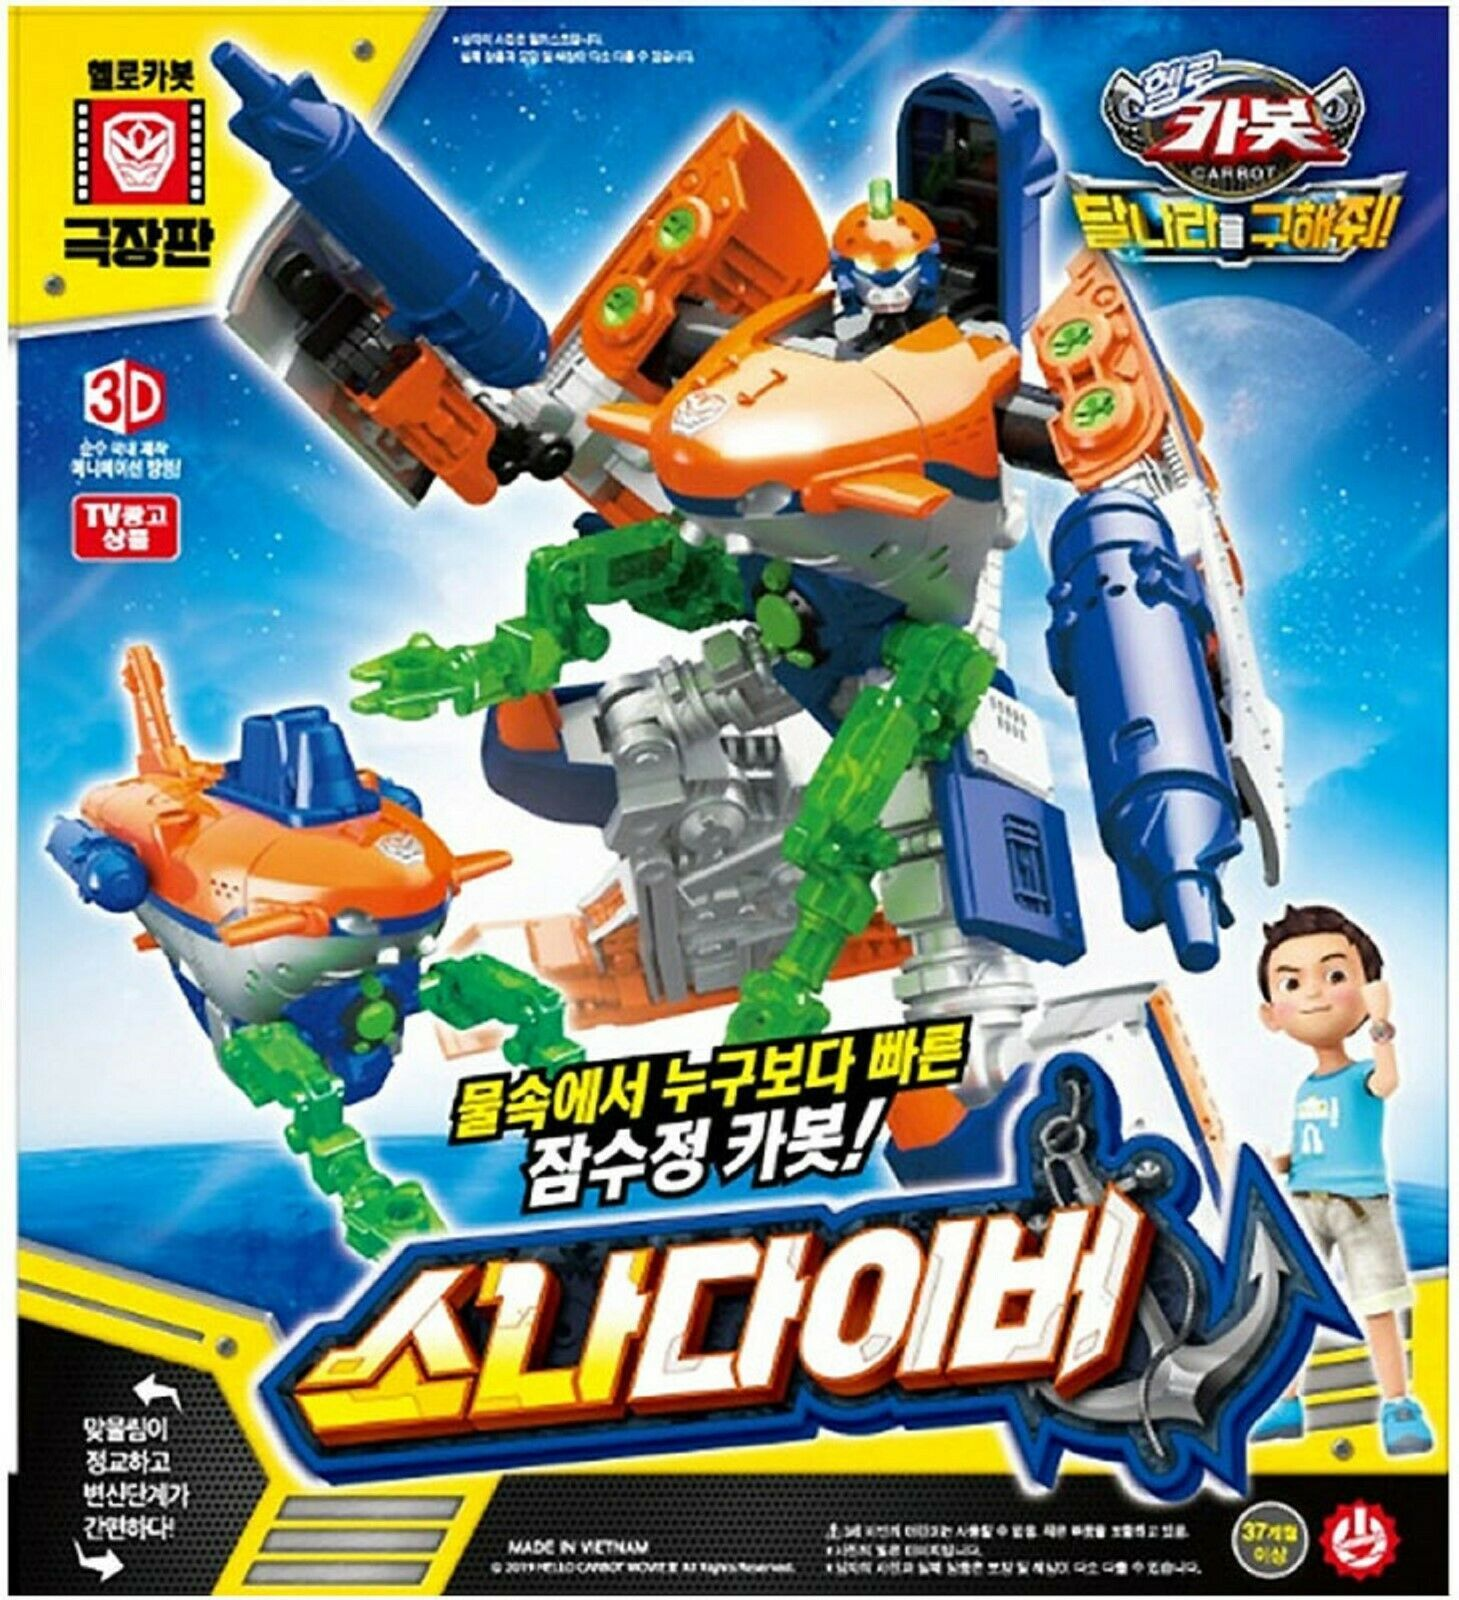 Hello Carbot Sonar Diver Submarine Transformation Transforming Toy Action Figure